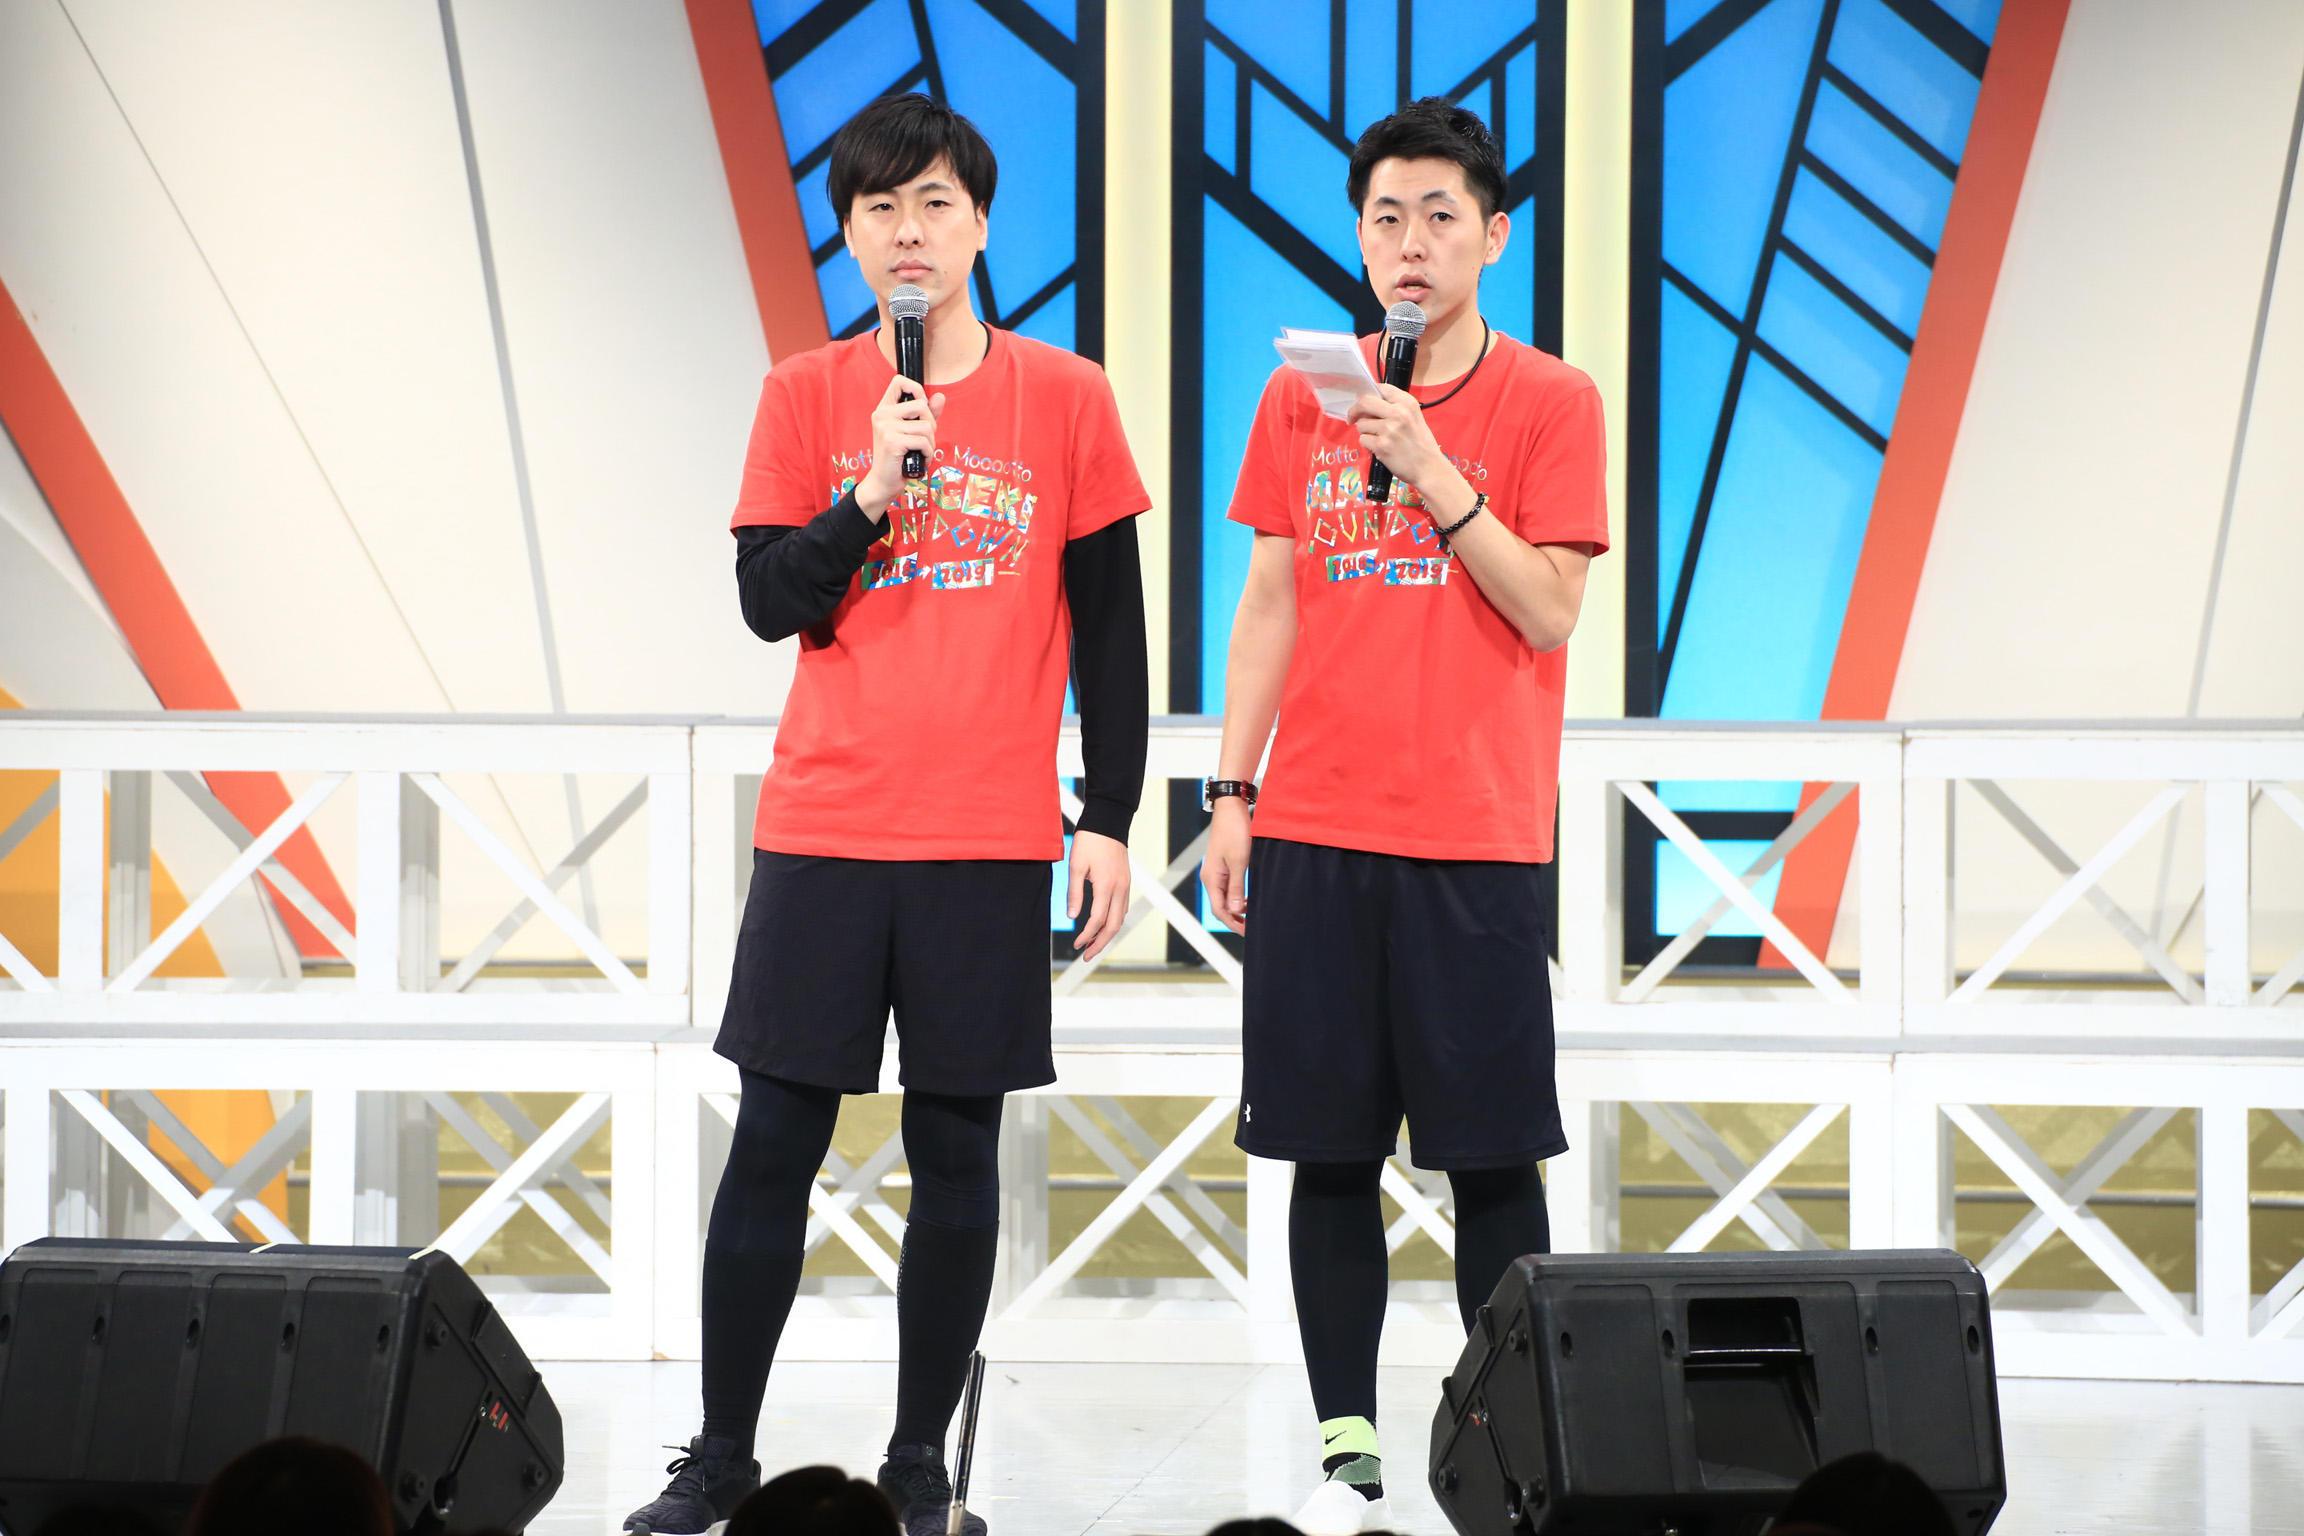 http://news.yoshimoto.co.jp/20190101110437-9175d9745517912e1660b1f93a2185ad87b1375e.jpg